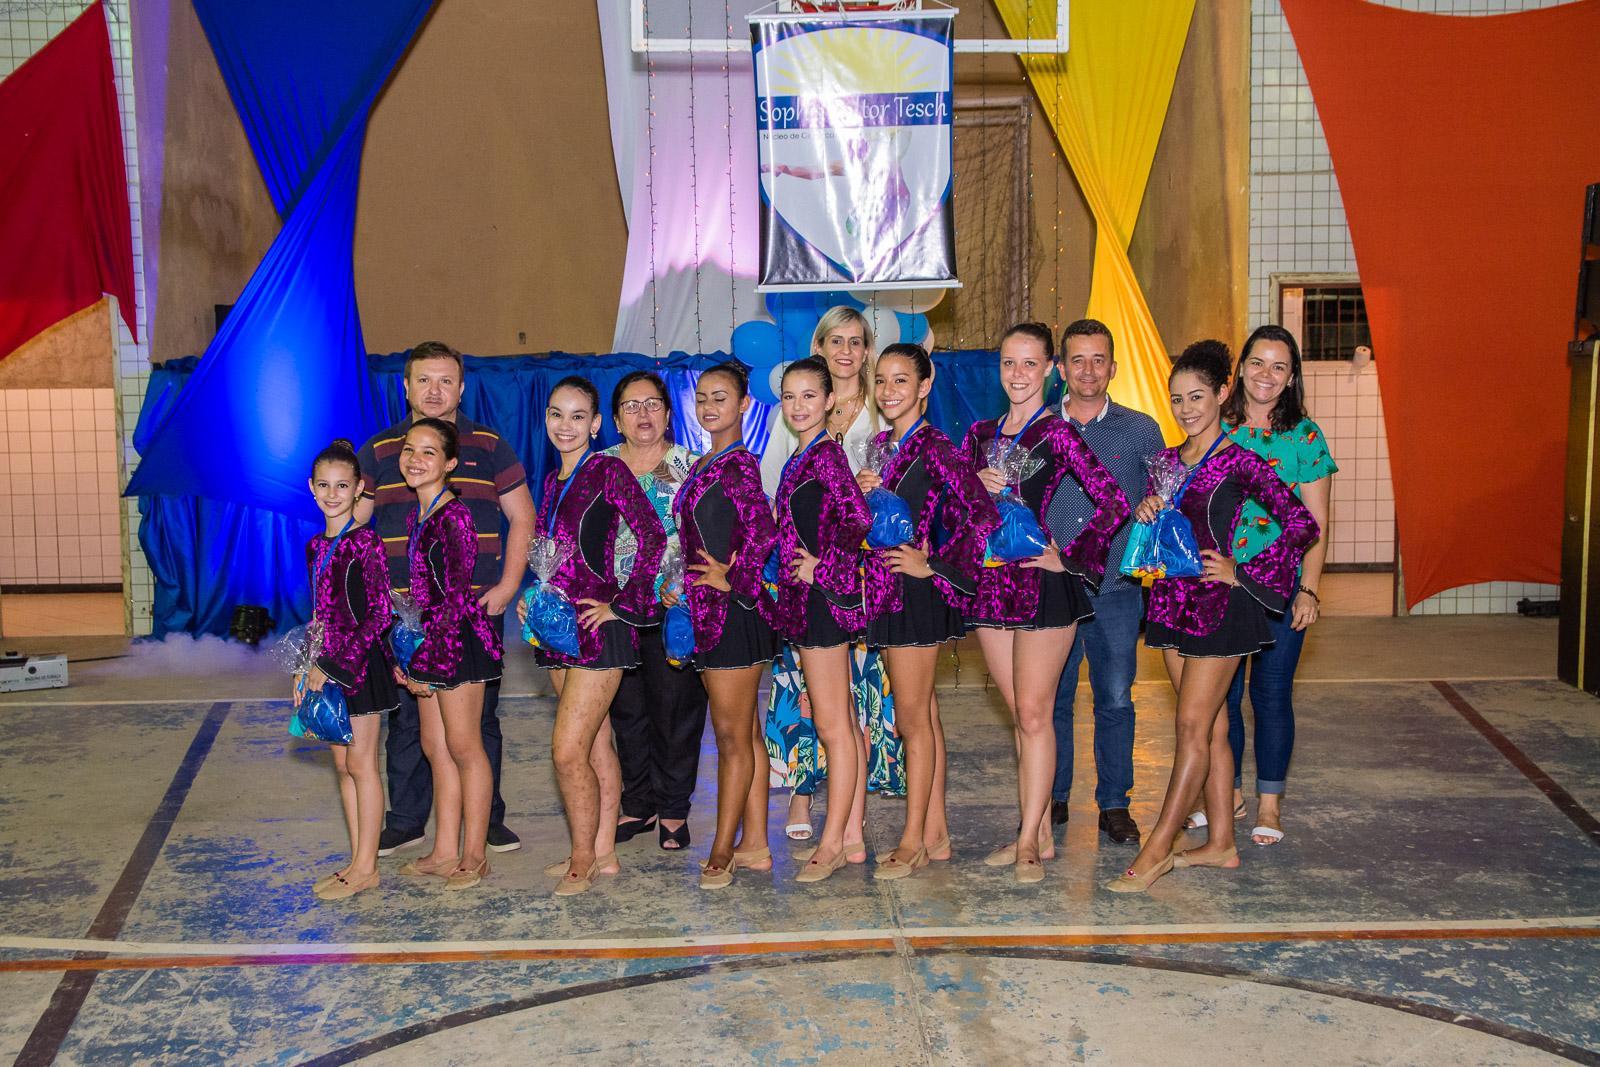 Secretaria de Desporto realizou Festival de Ginástica Rítmica, evento encerrou as atividades de 2018